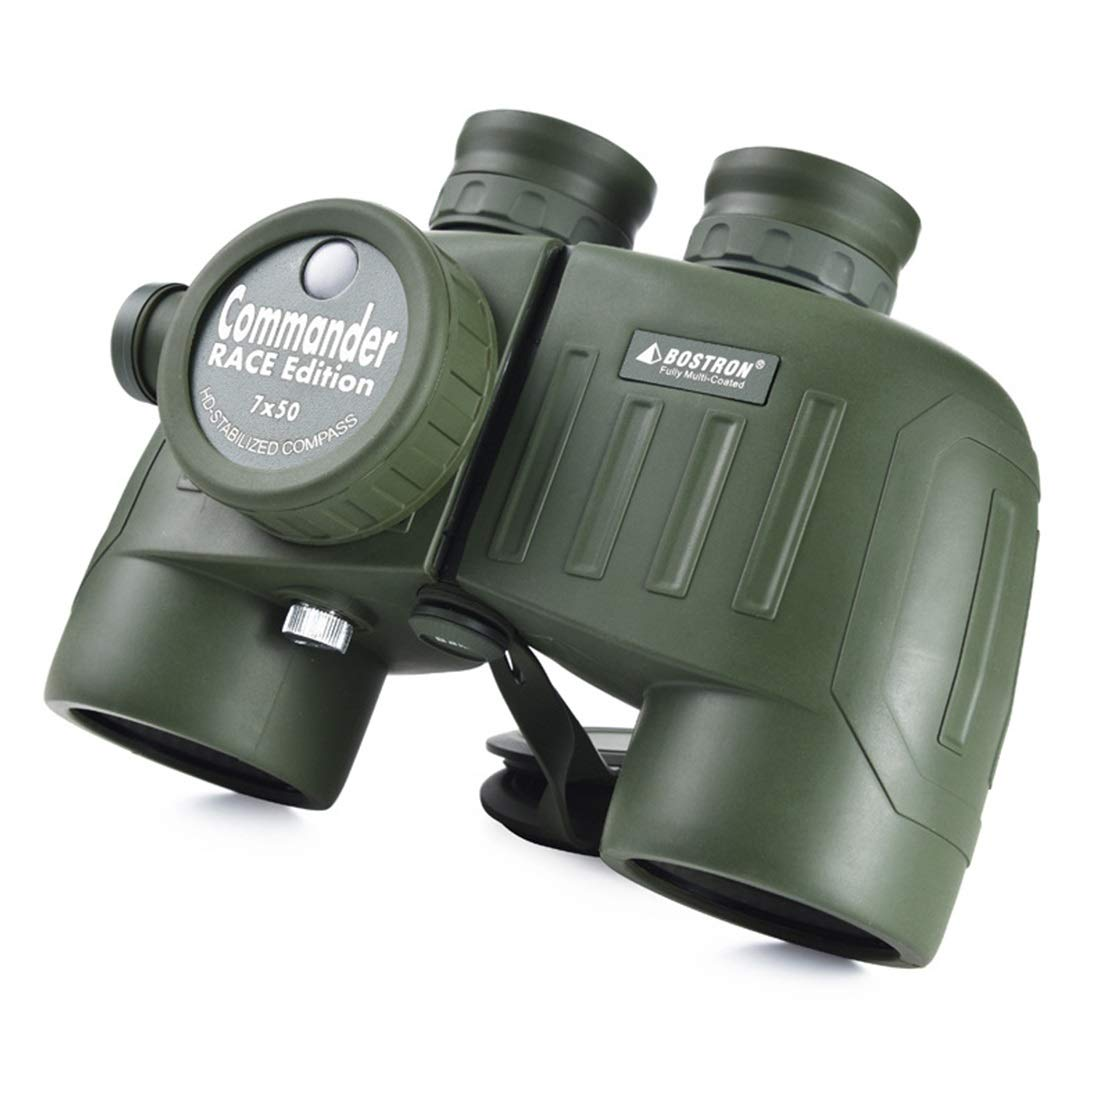 linan 子供の大人のための7x50コンパクトフォグプルーフ双眼鏡、鳥の鑑賞のためのコンパス折りたたみ望遠鏡キャリングバッグとキャンプとスポーツゲーム   B07J3XXBBY